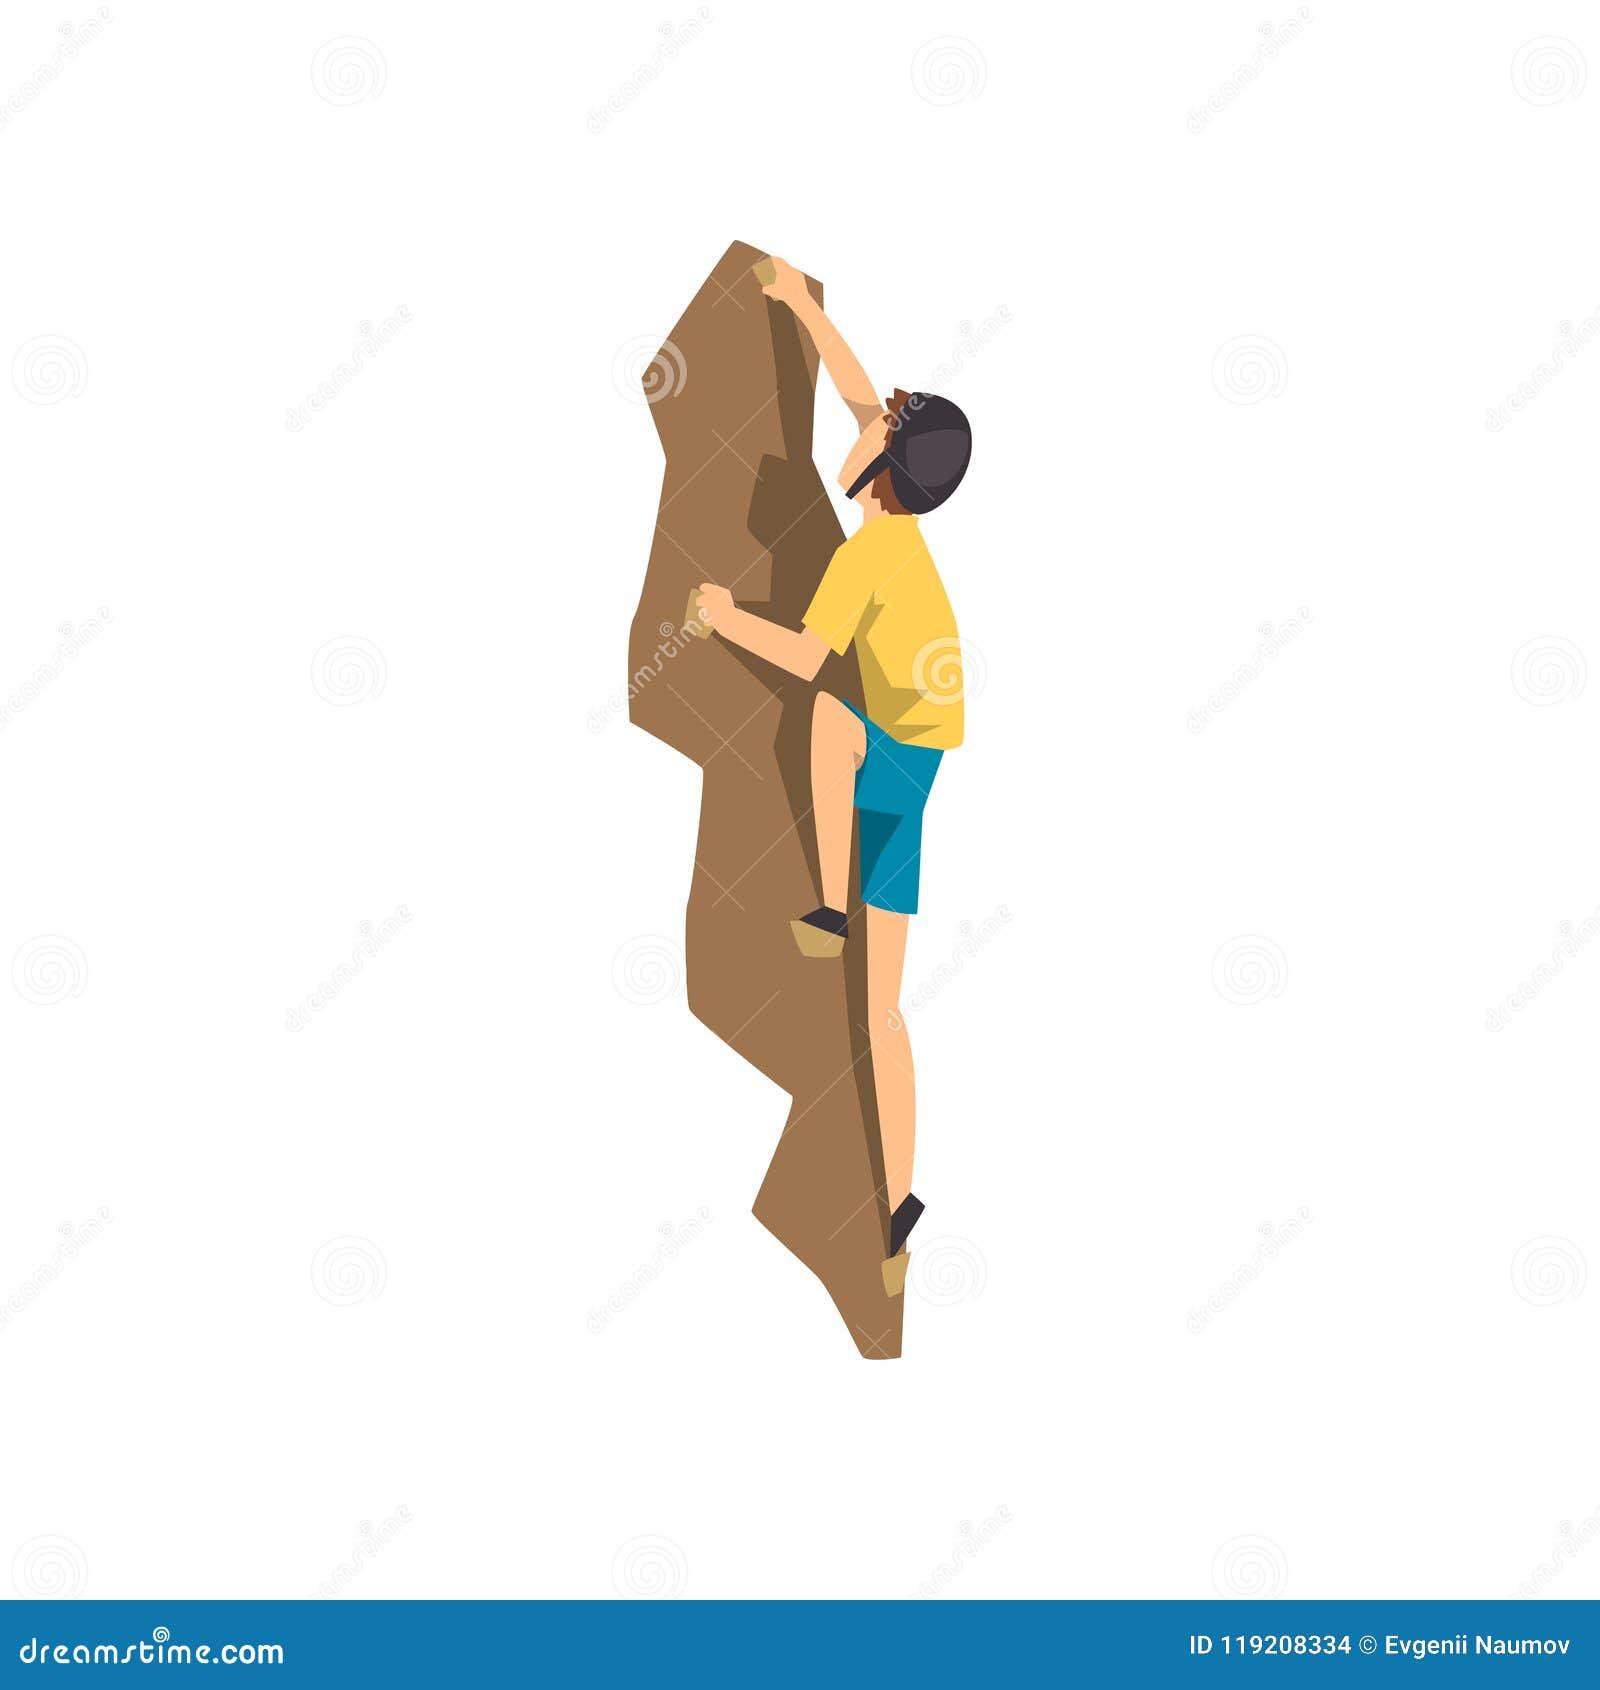 O montanhista na parede de escalada da rocha do capacete protetor, o esporte extremo e o conceito da atividade de lazer vector a